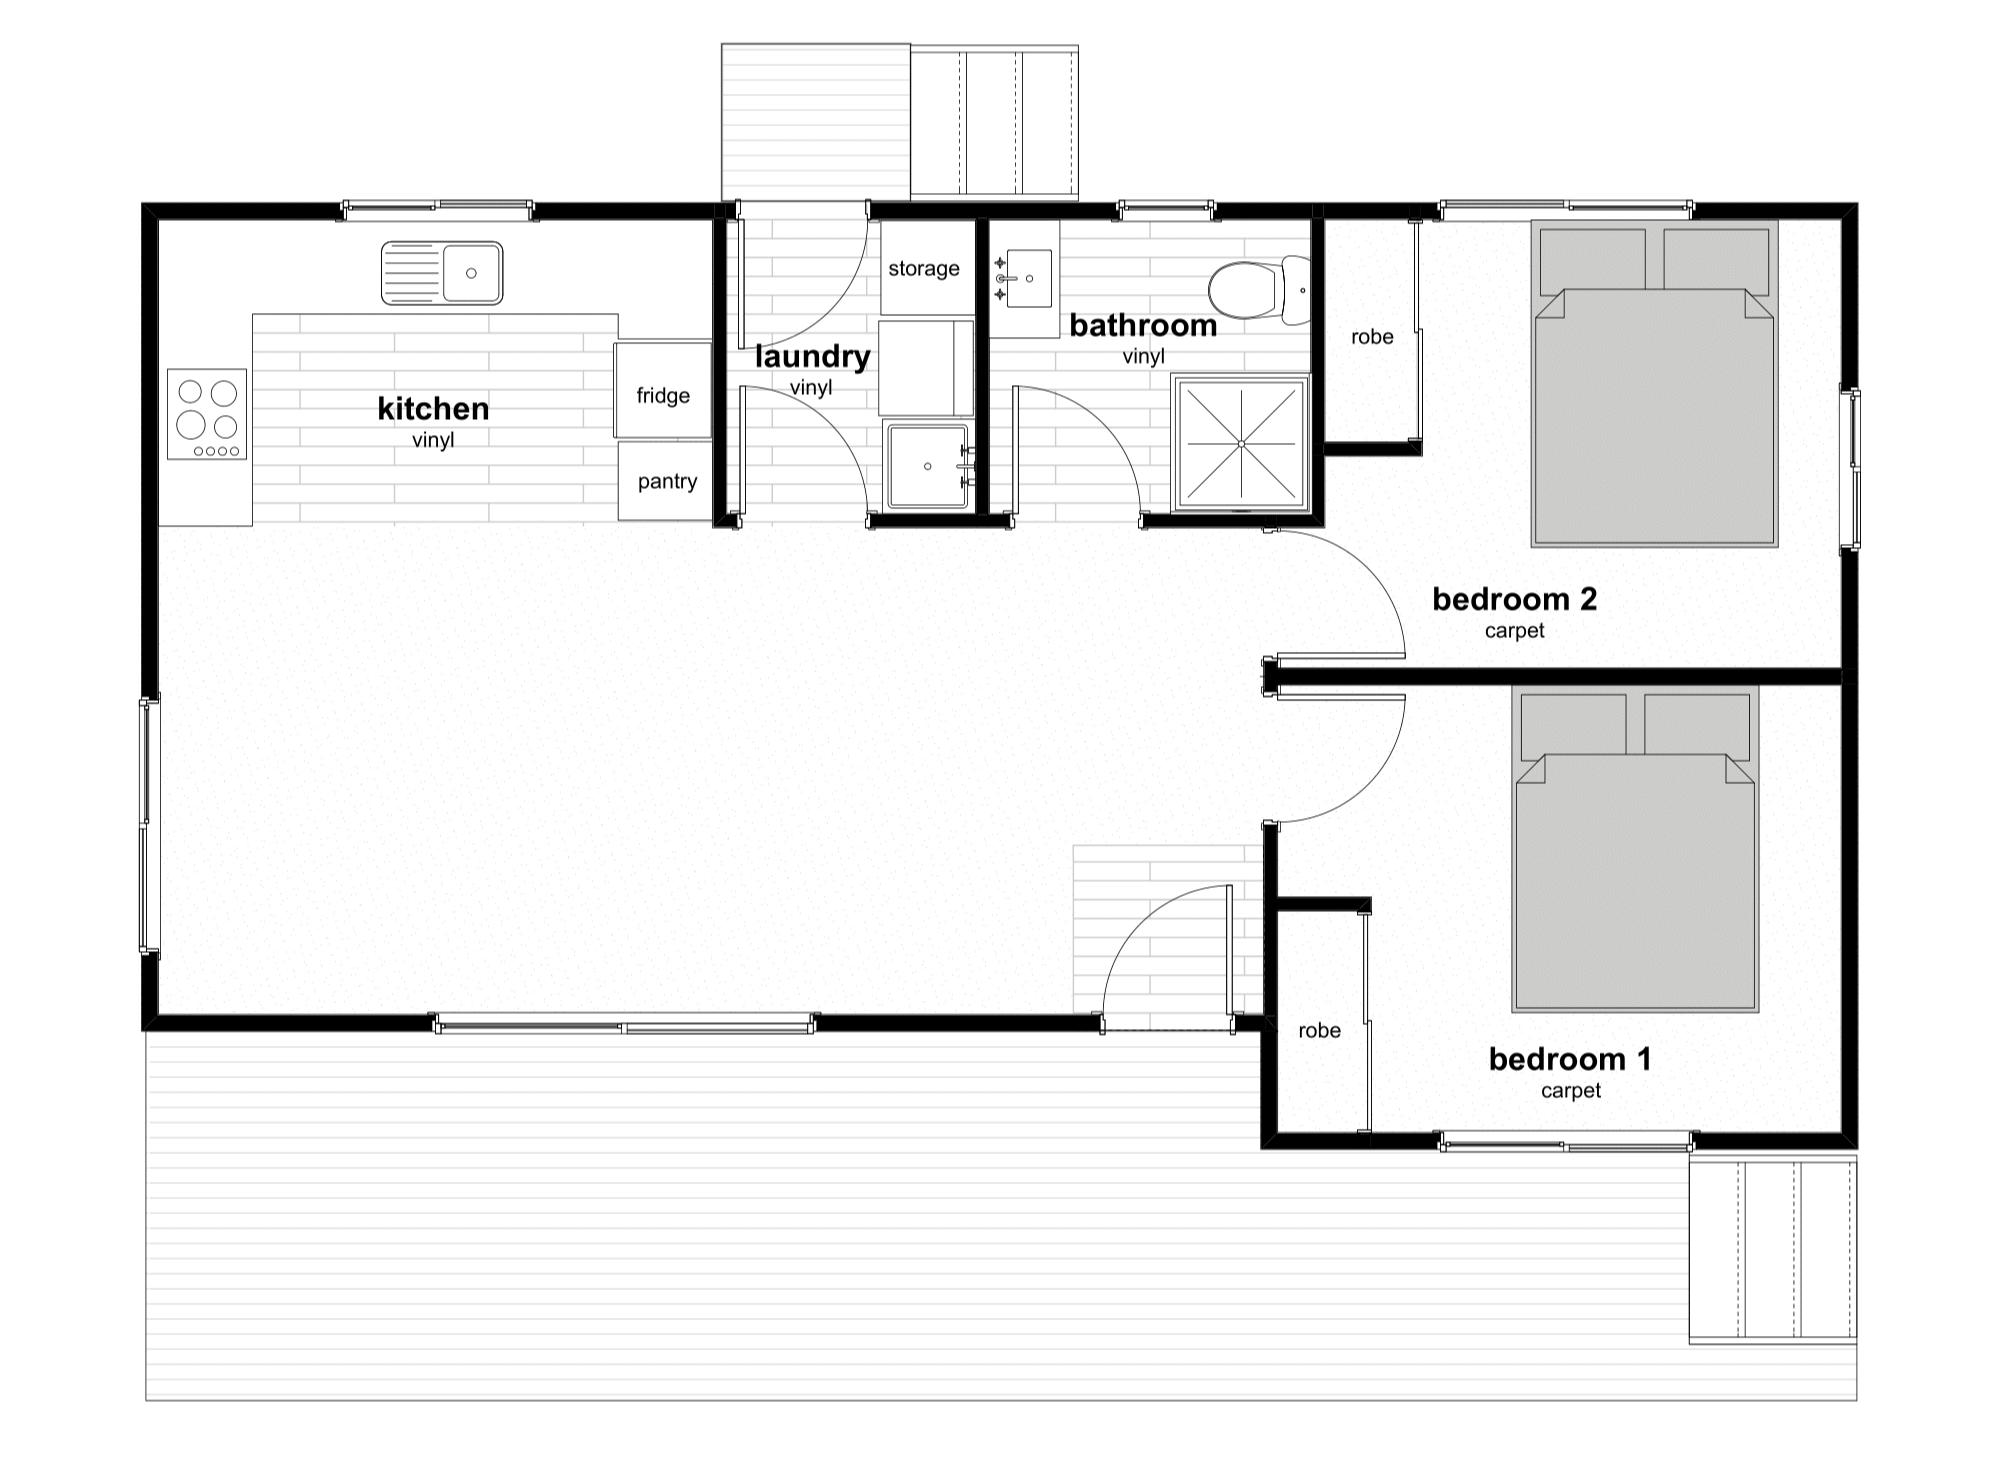 Prefab home Floorplan